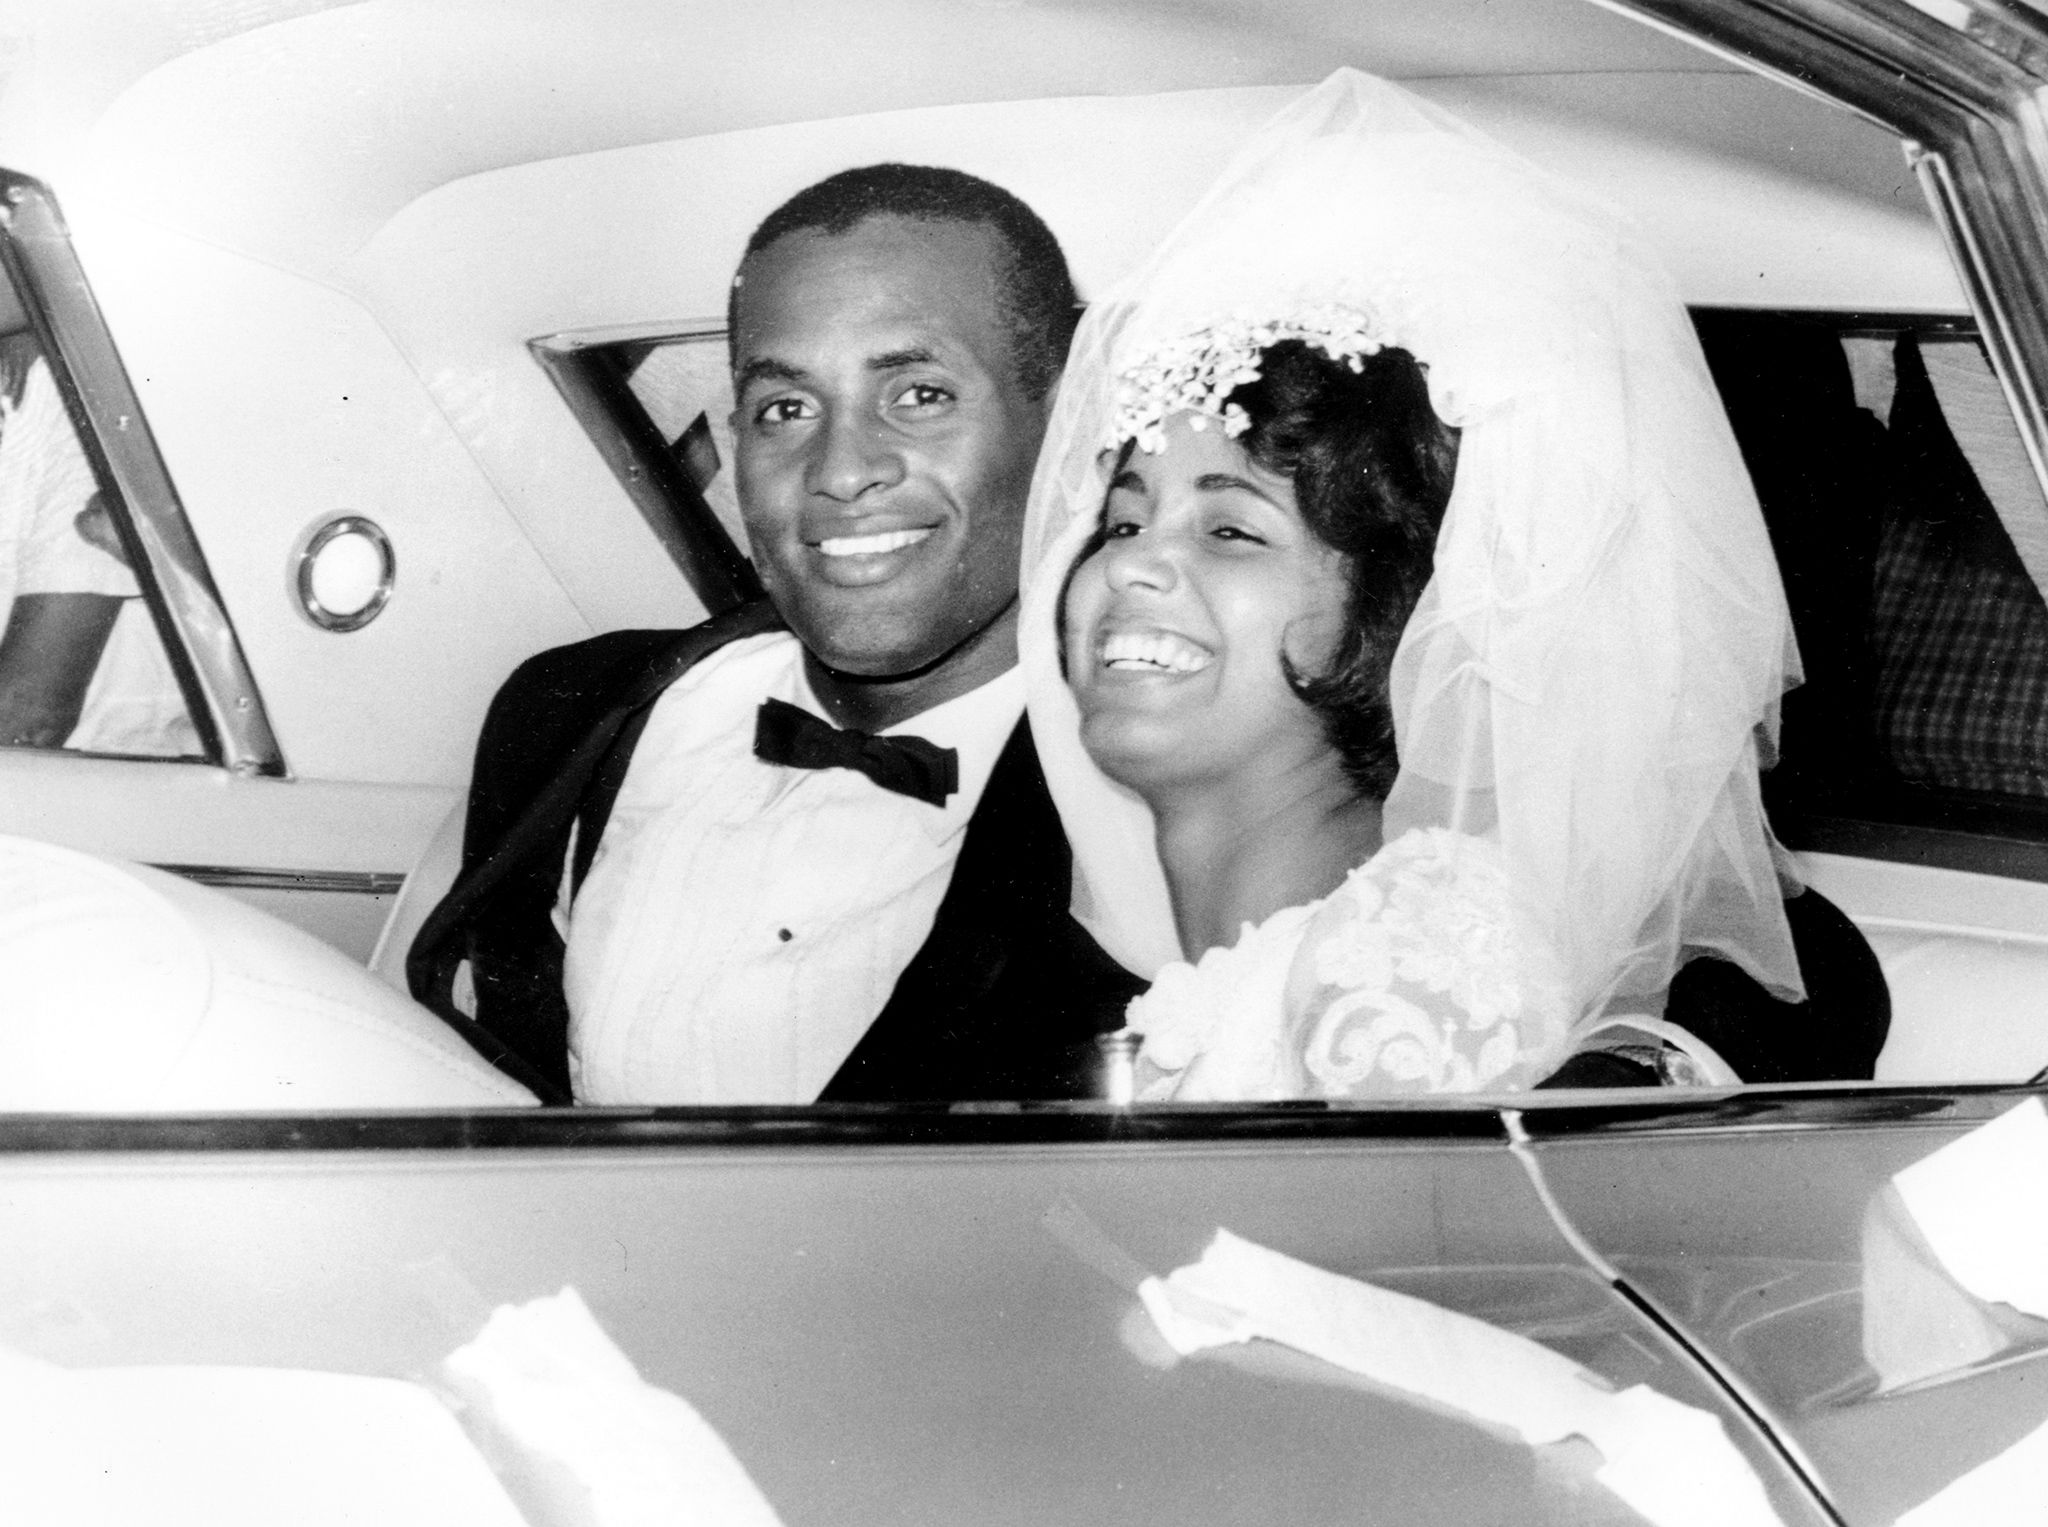 Bendicin de amor - Galera de Fotos: Roberto Clemente - ESPN